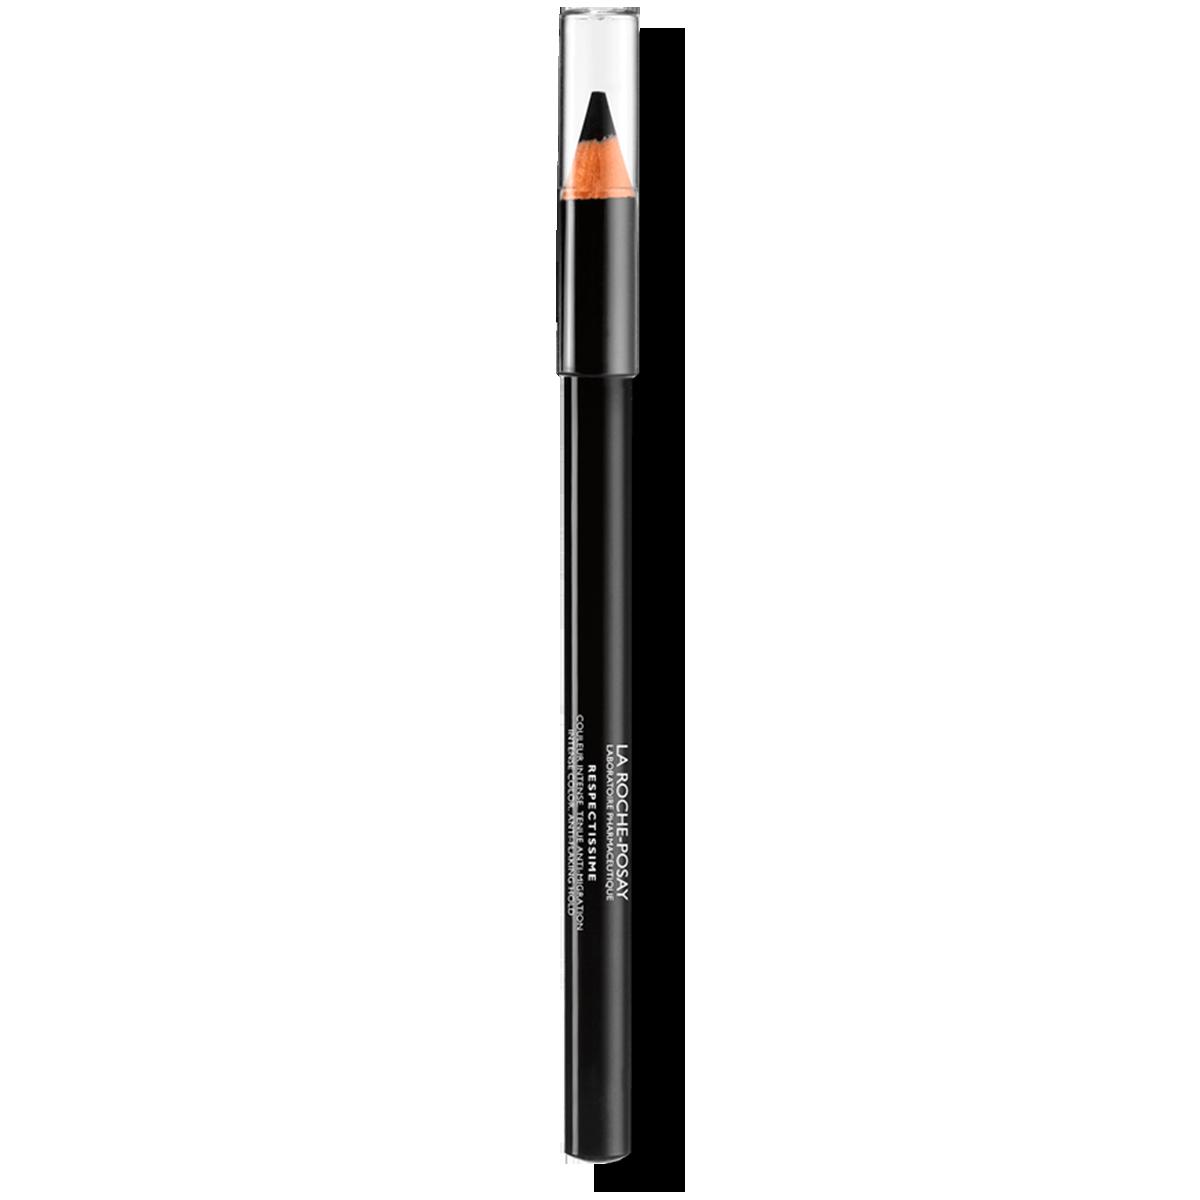 La Roche Posay Sensitiv Toleriane Sminke EYE PENCIL Sort 3337872410